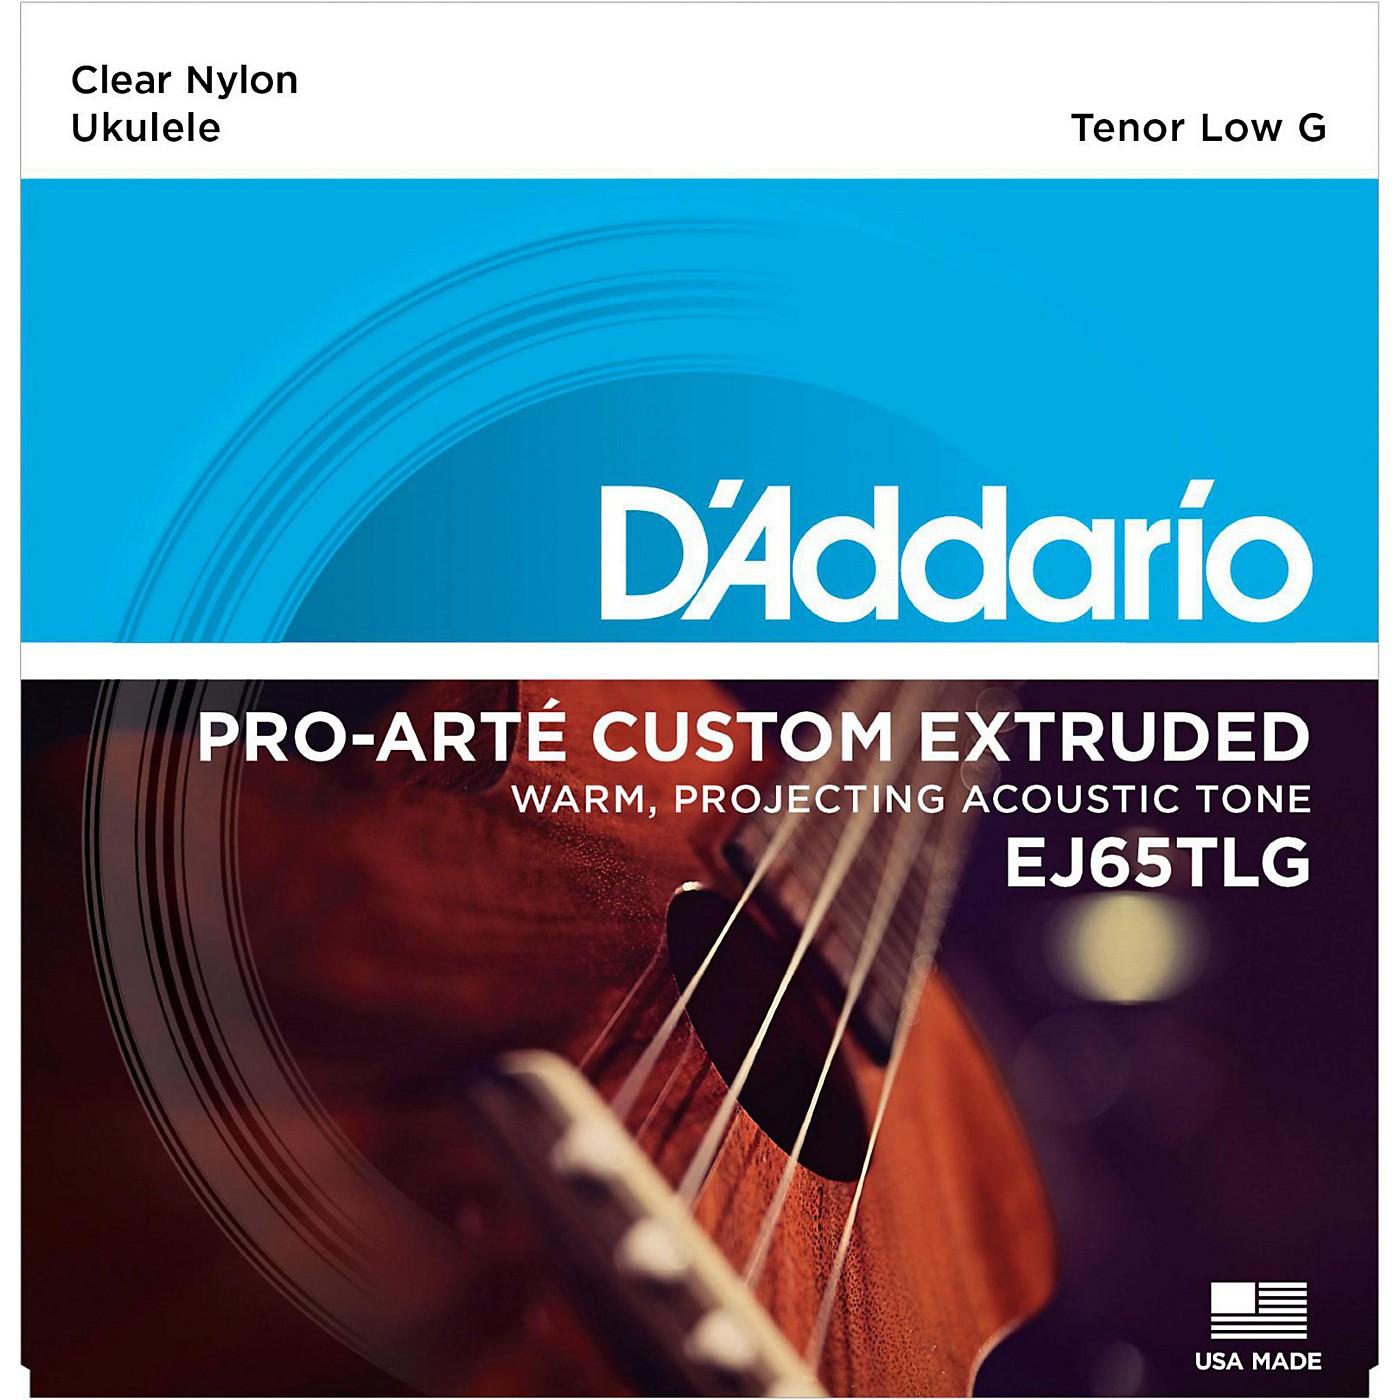 D'Addario EJ65TLG Pro-Arte Custom Extruded Tenor Low G Nylon Ukulele Strings thumbnail